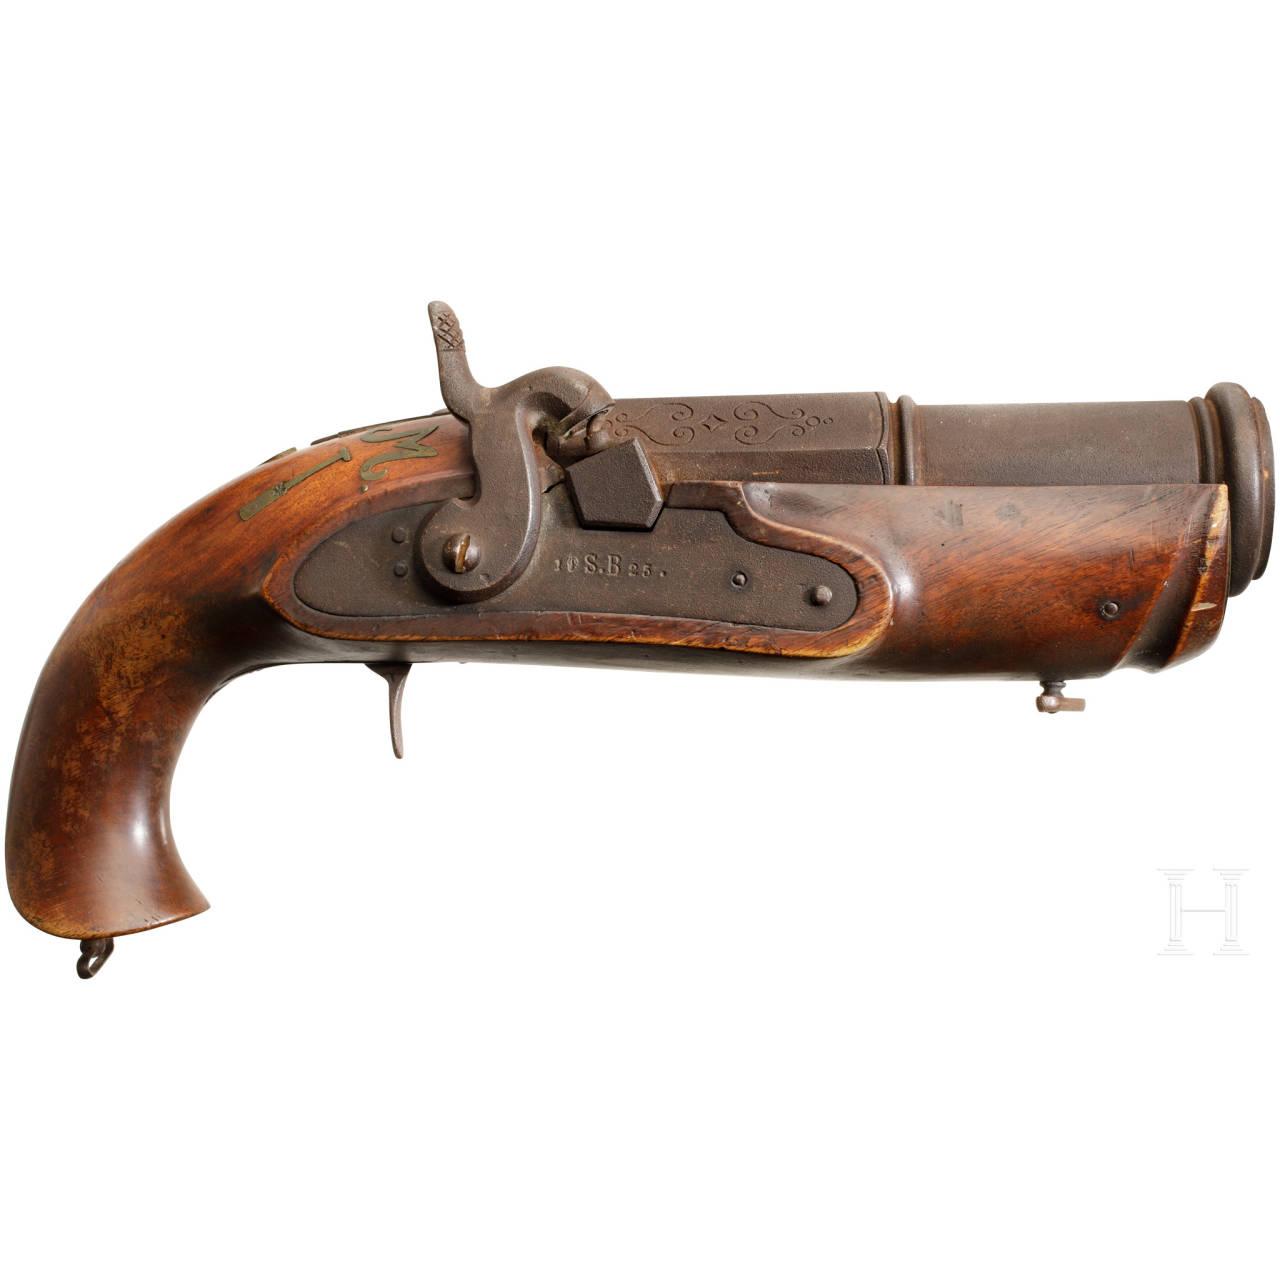 A South German saluting gun, dated 1925